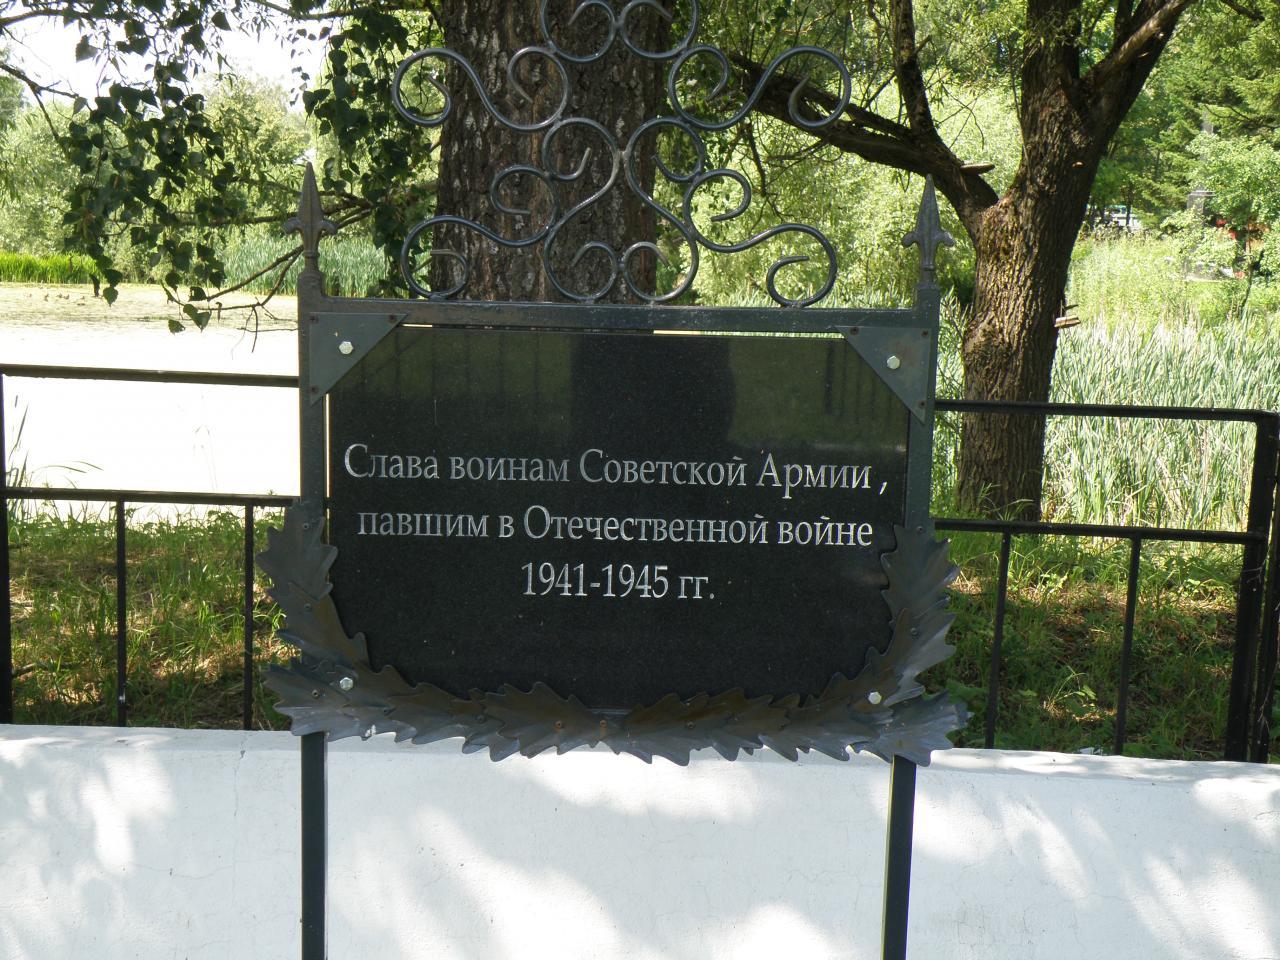 http://photos.wikimapia.org/p/00/04/98/75/80_1280.jpg